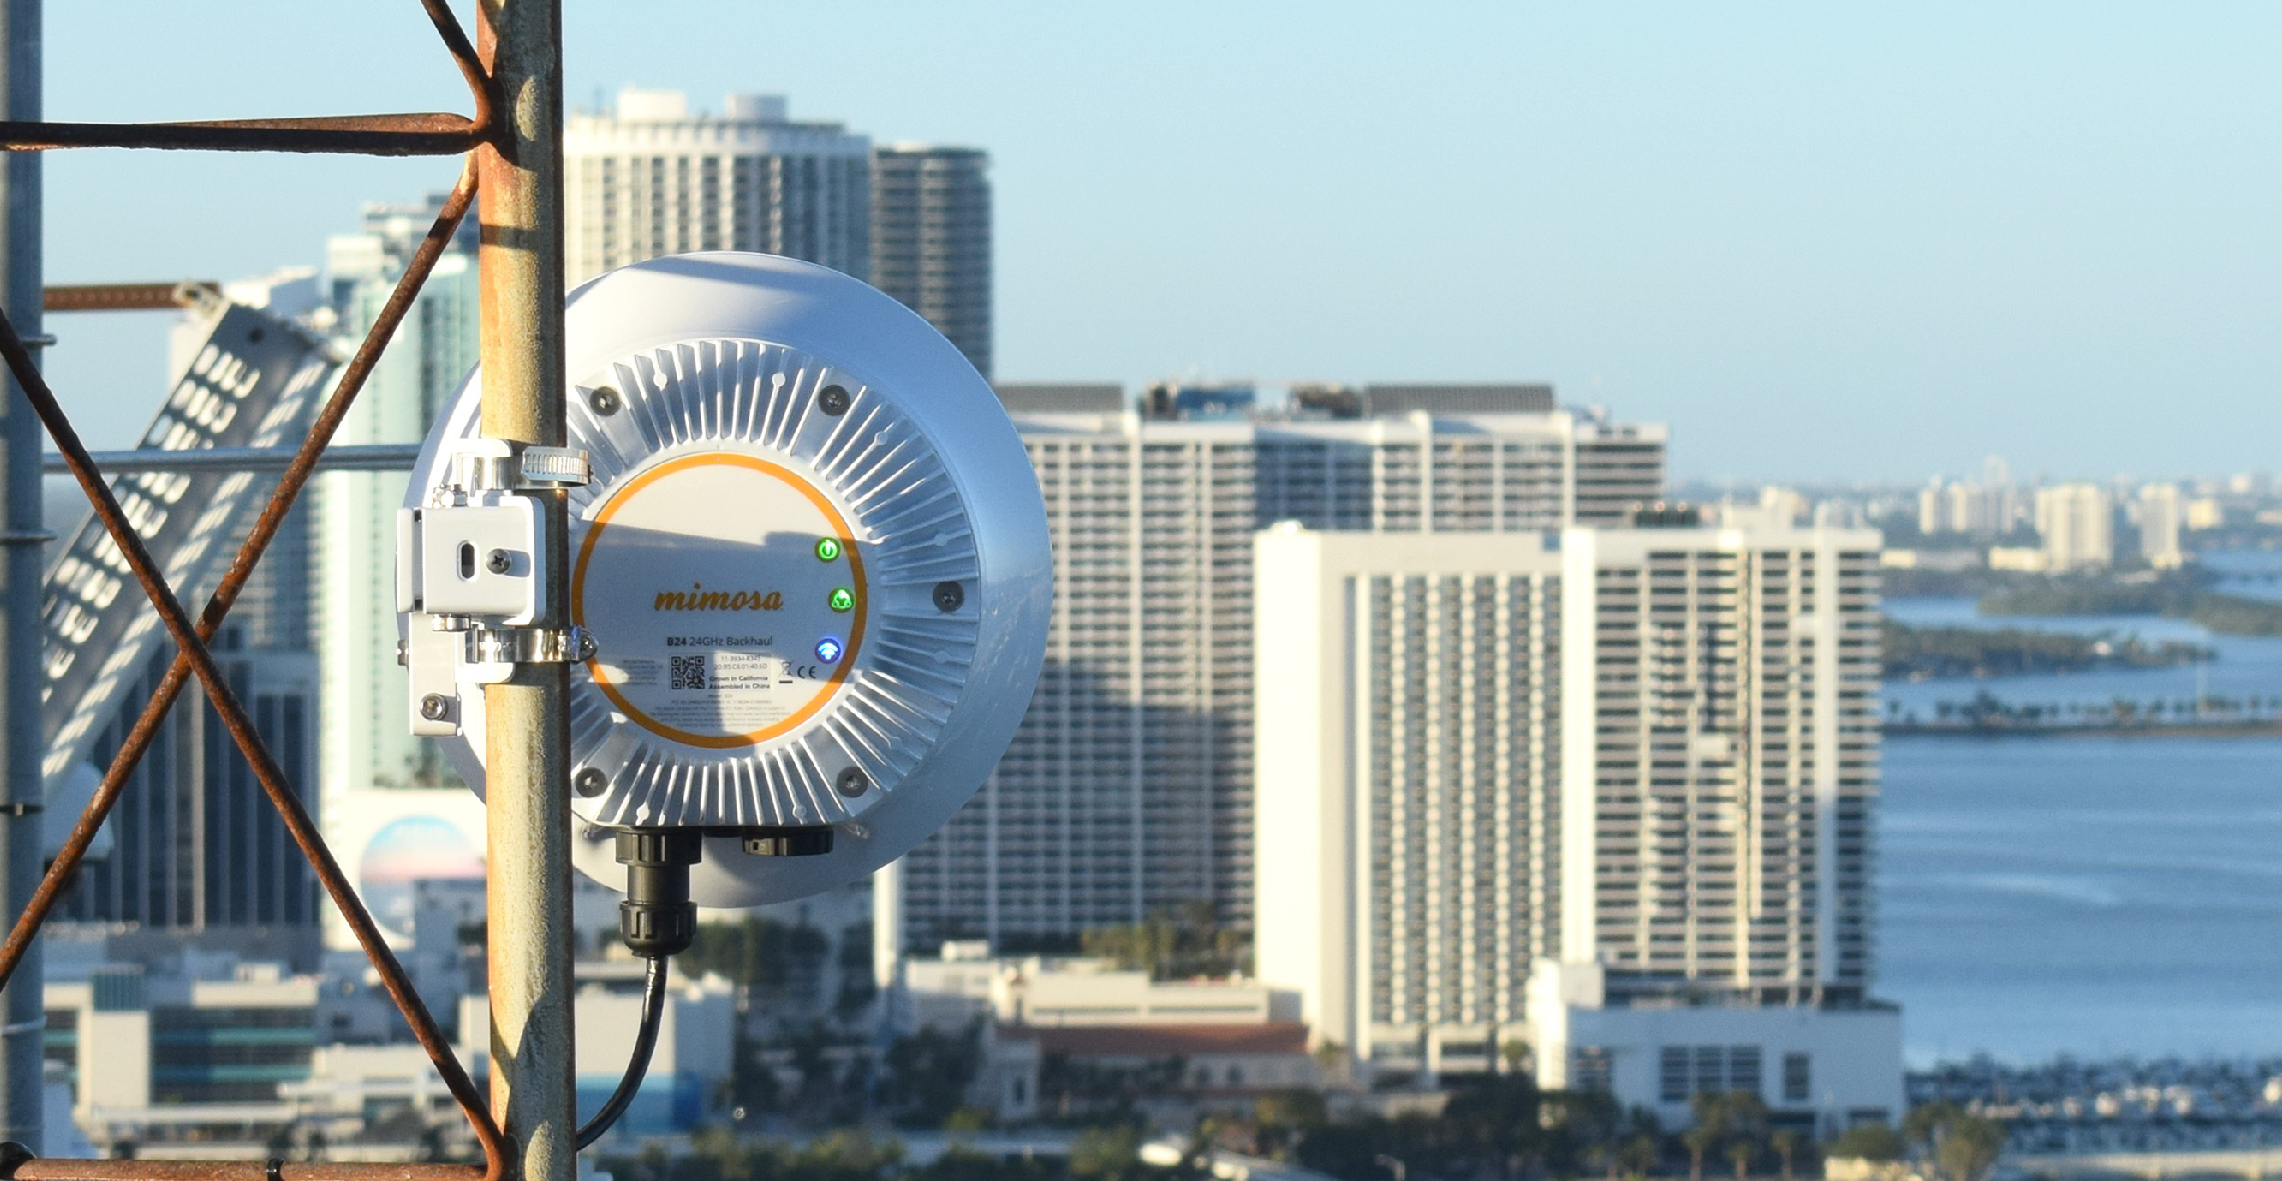 Mimosa Smart City Solution